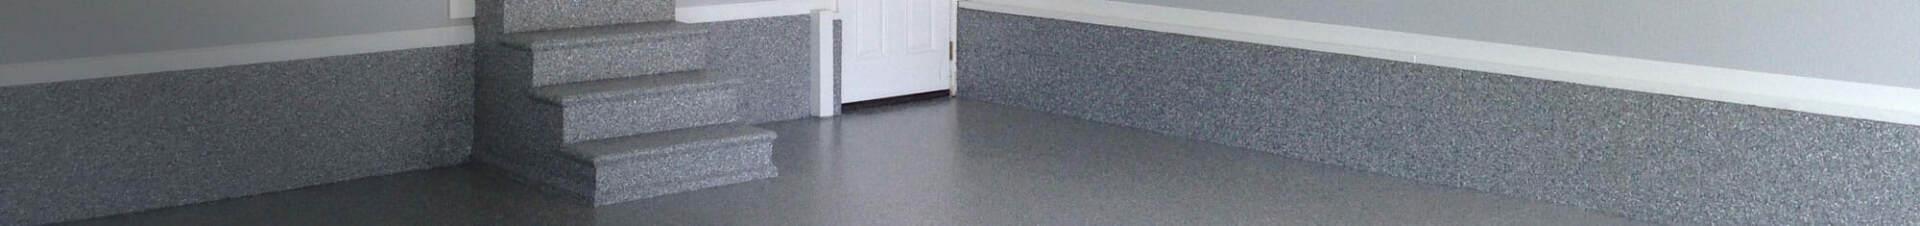 Garage Cabinet Finish Options | garage organization cabinets | Garage Flooring Companies | Overhead Storage Rack